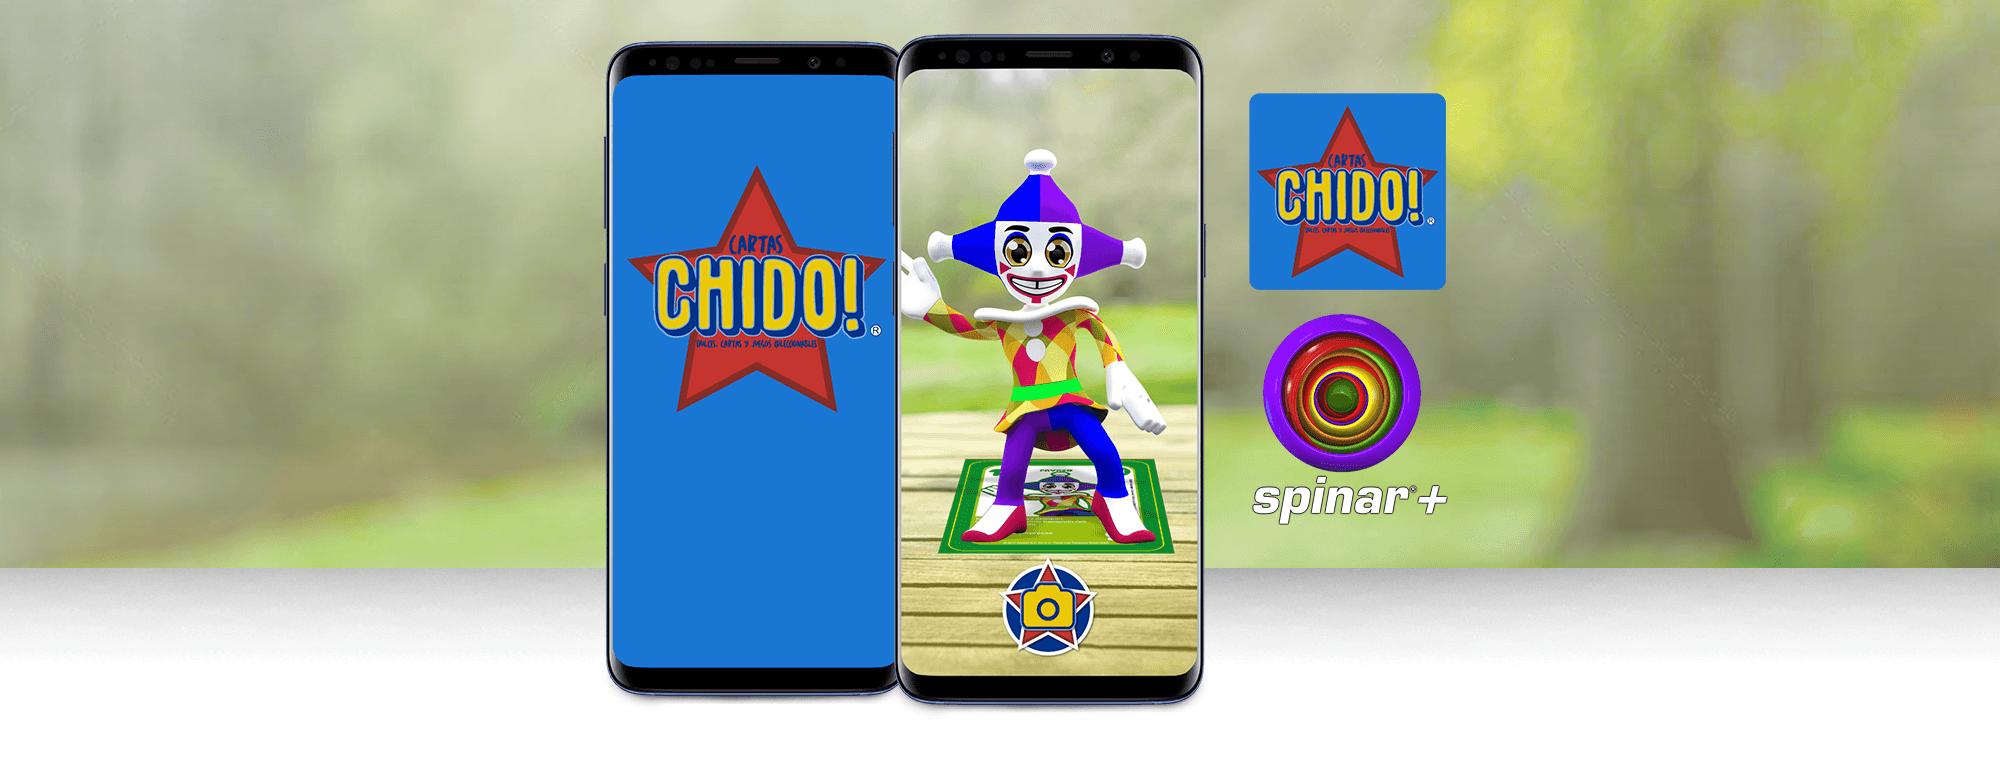 AR playing cards: Cartas Chido AR app